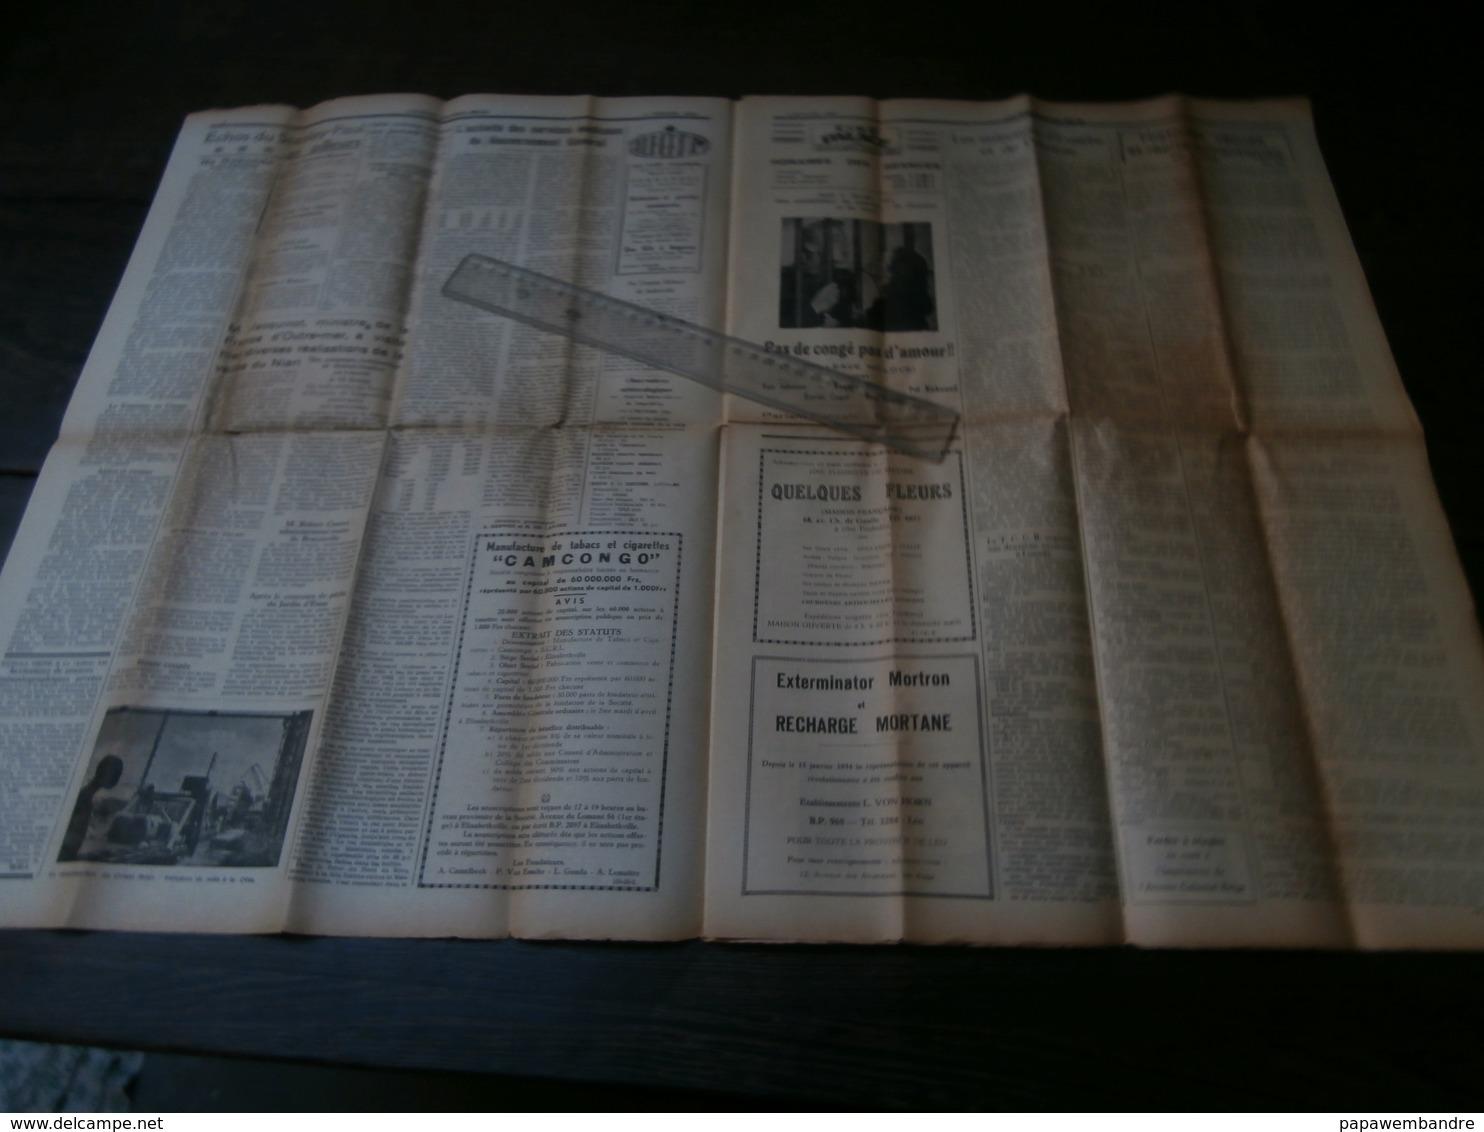 L'Avenir Colonial Belge 35 Du 4 Février 1954 : Congo, Molotov, AMI, Niari, - Kranten